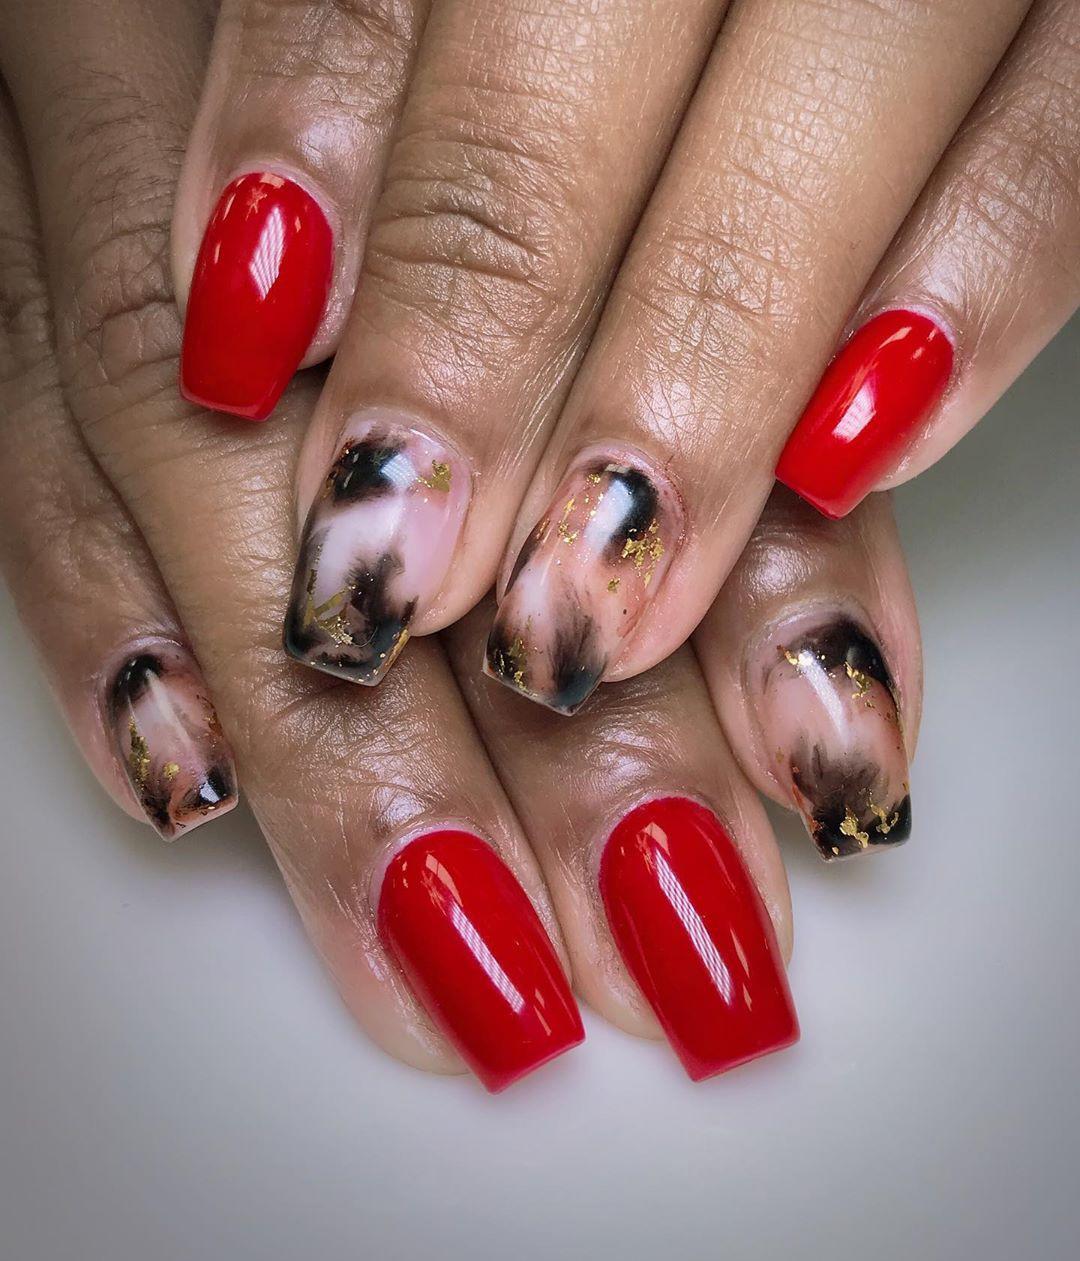 Pretty Nail Art Designs for Short Acrylic Nails,short acrylic nails coffin,short acrylic nails square,acrylic nail designs for spring,short acrylic nails almond